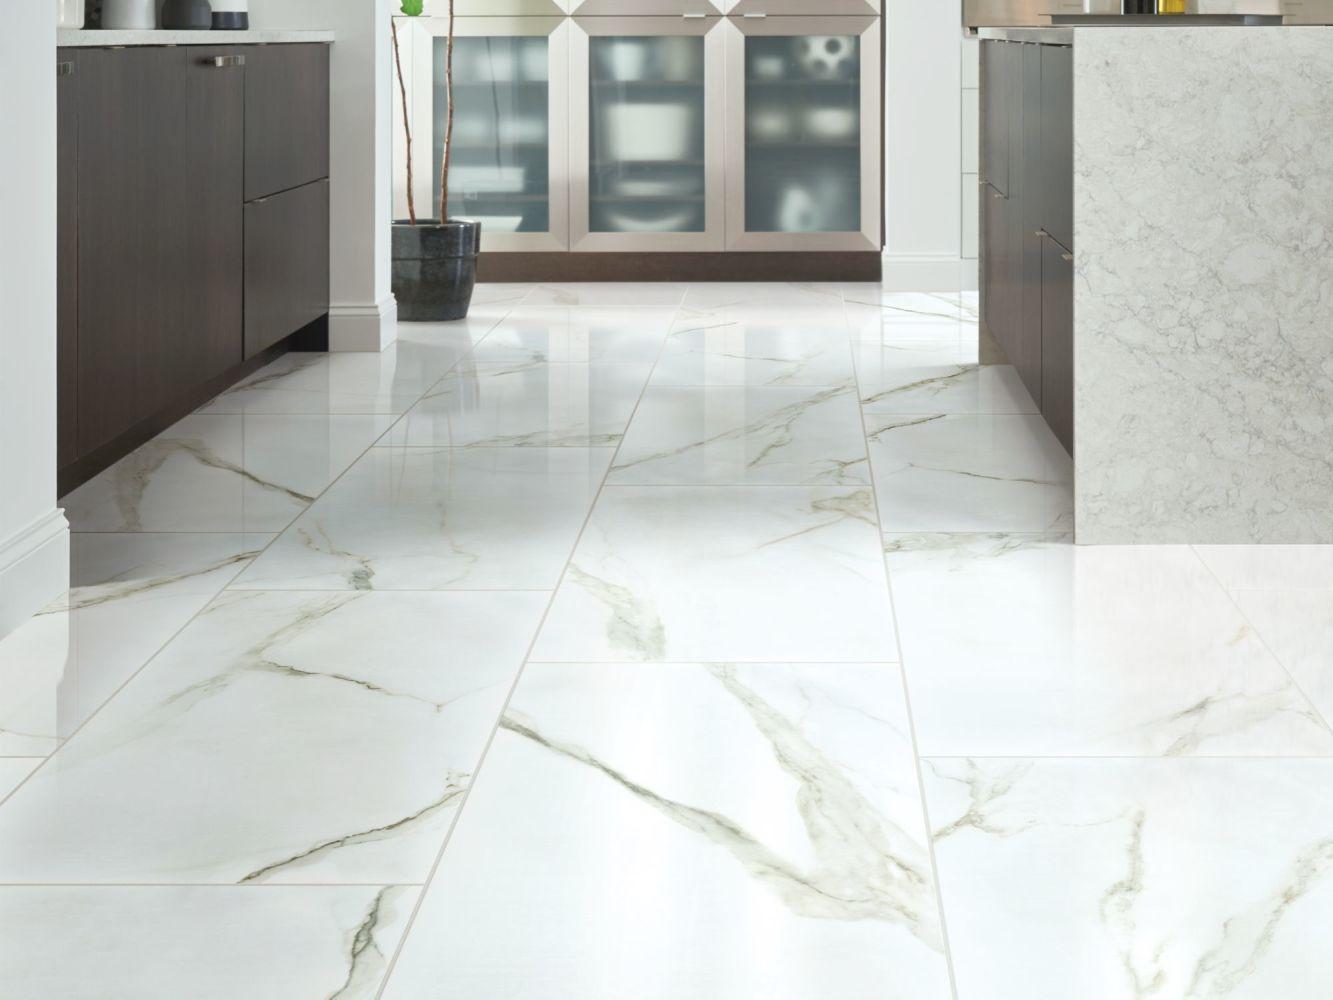 Shaw Floors Home Fn Gold Ceramic Stonehenge 16×32 Matte Calacatta 00121_TG47D